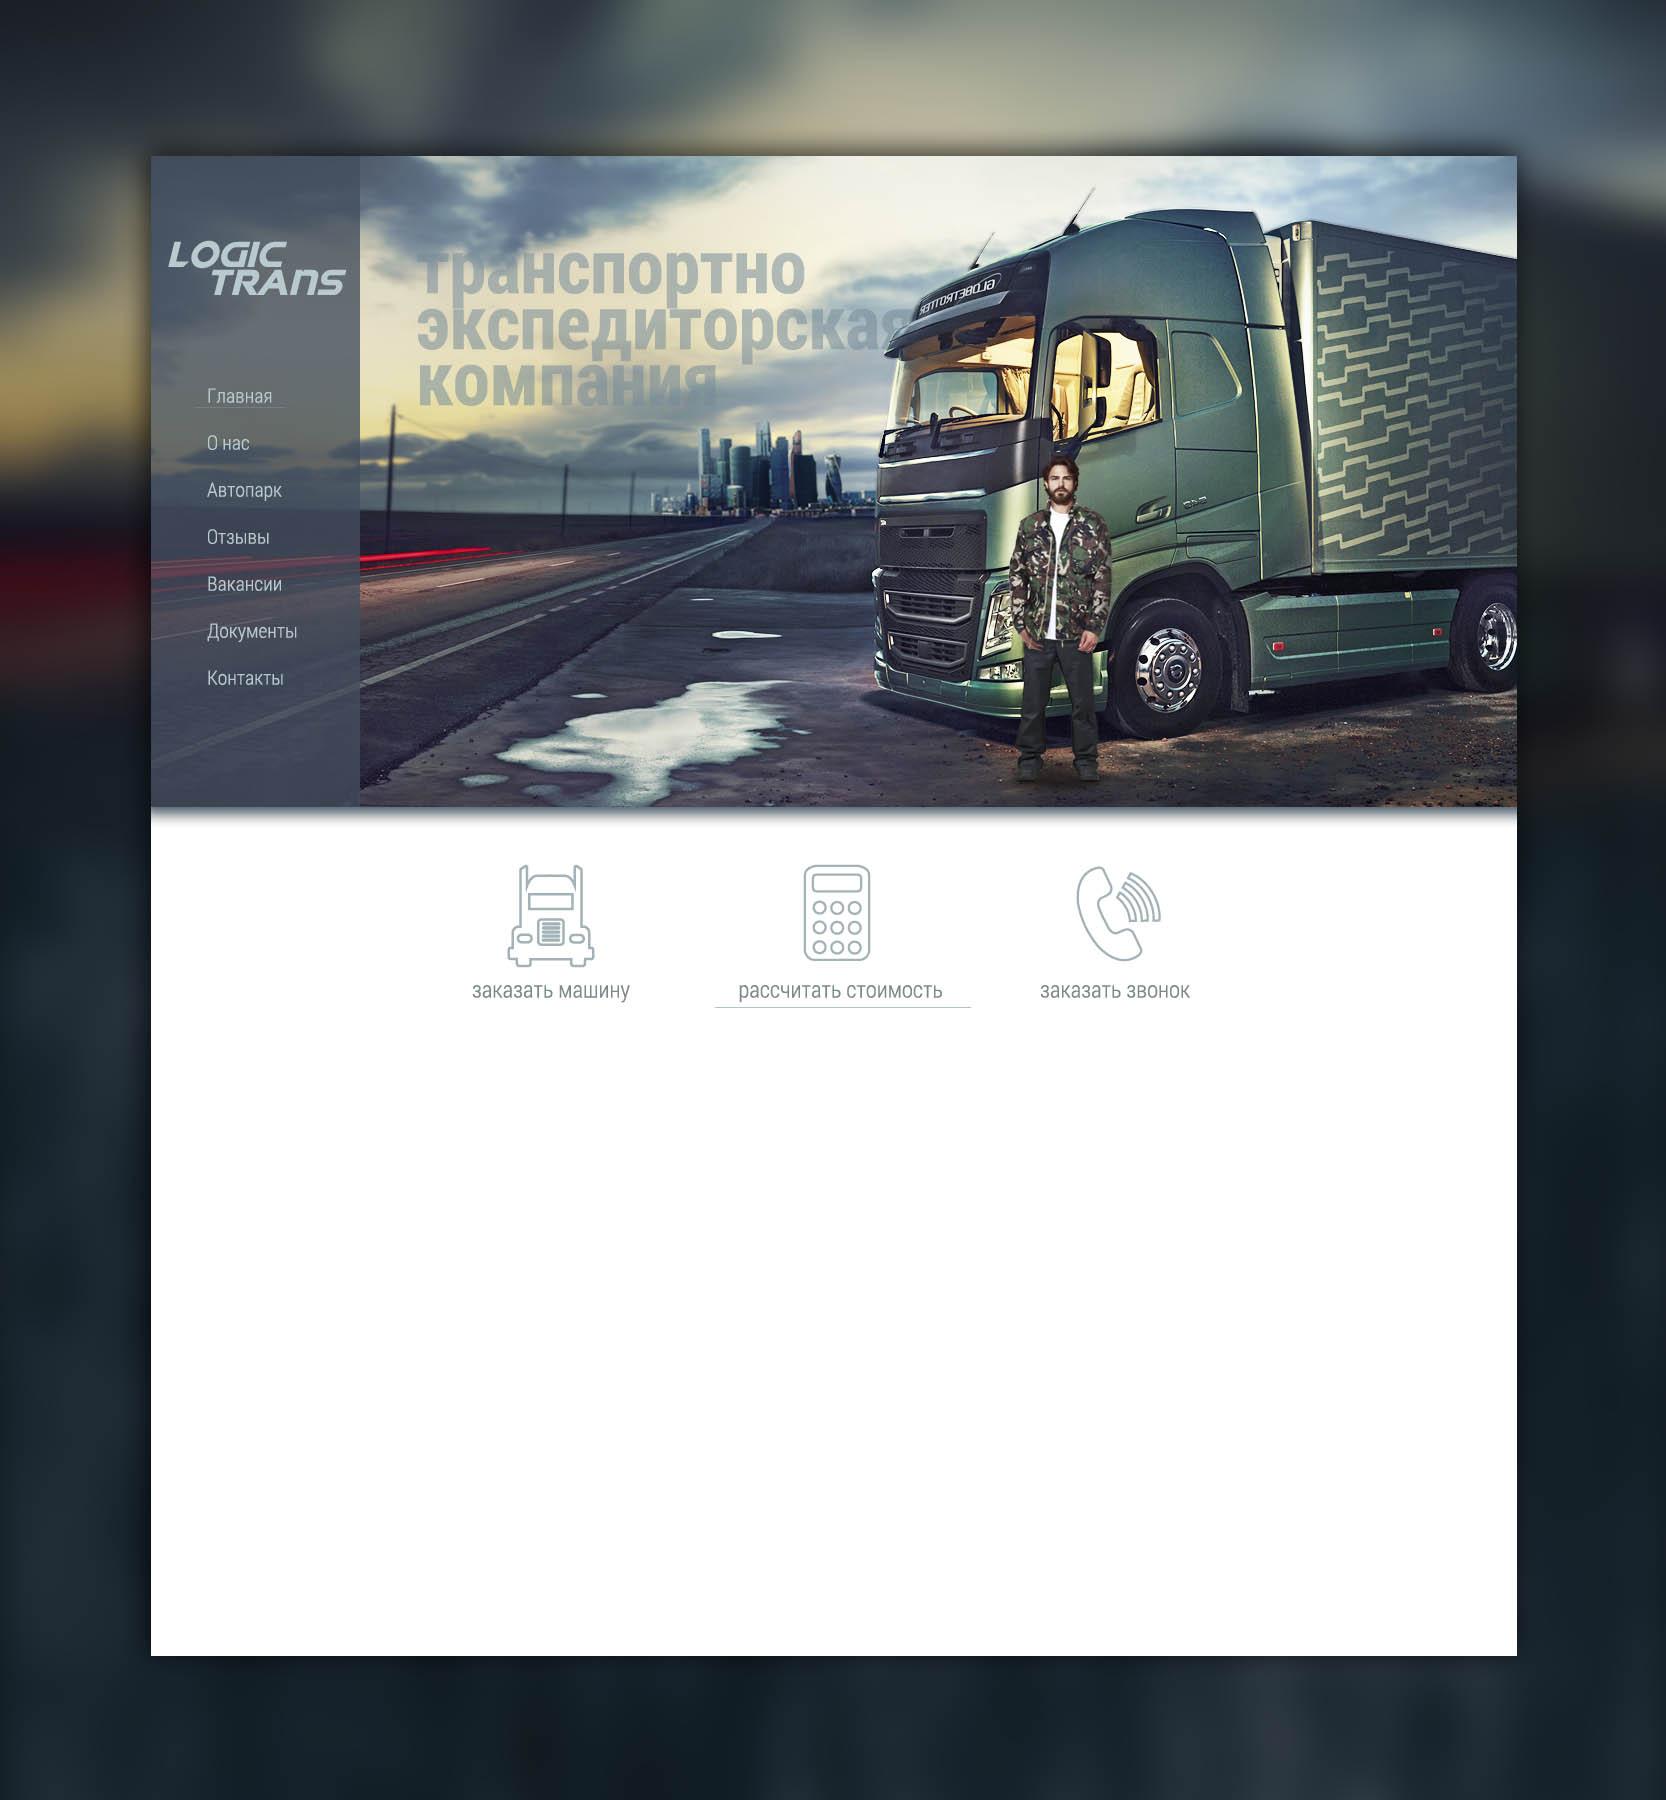 Дизайн сайта транспортно-экспедиторской компании ЛогикТранс фото f_9015a436640e80c5.jpg